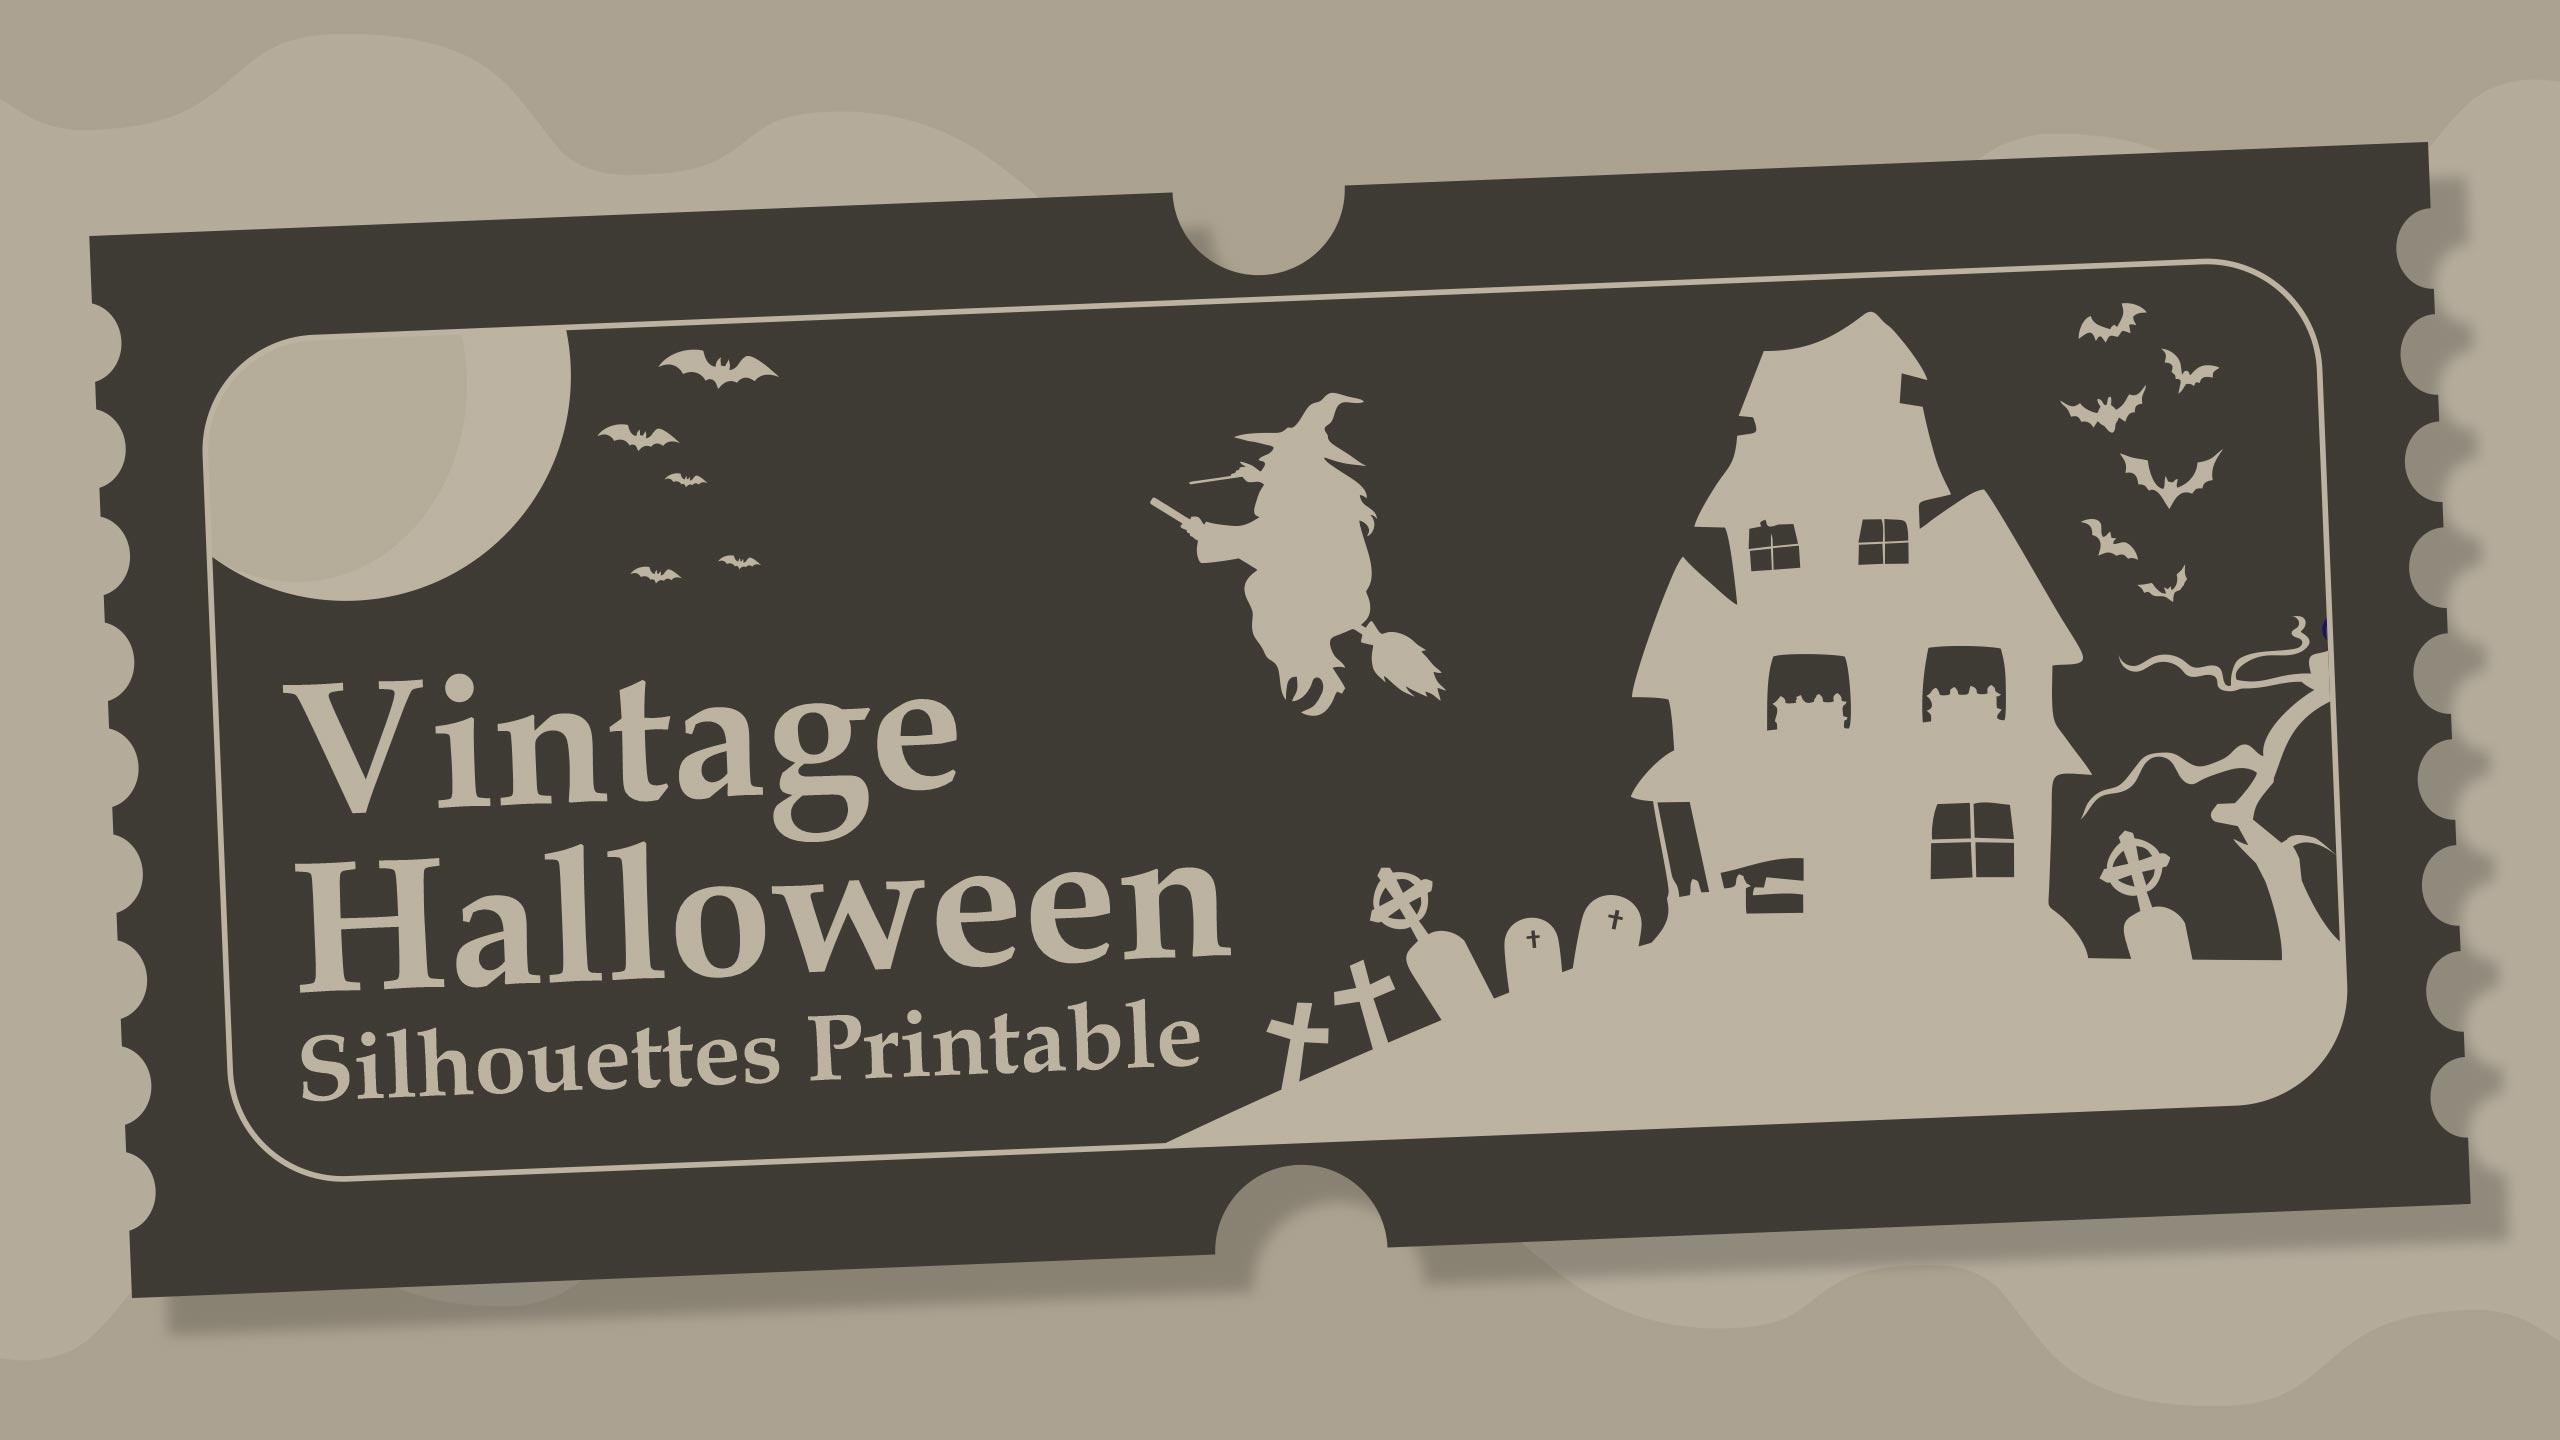 Vintage Halloween Silhouettes Printable